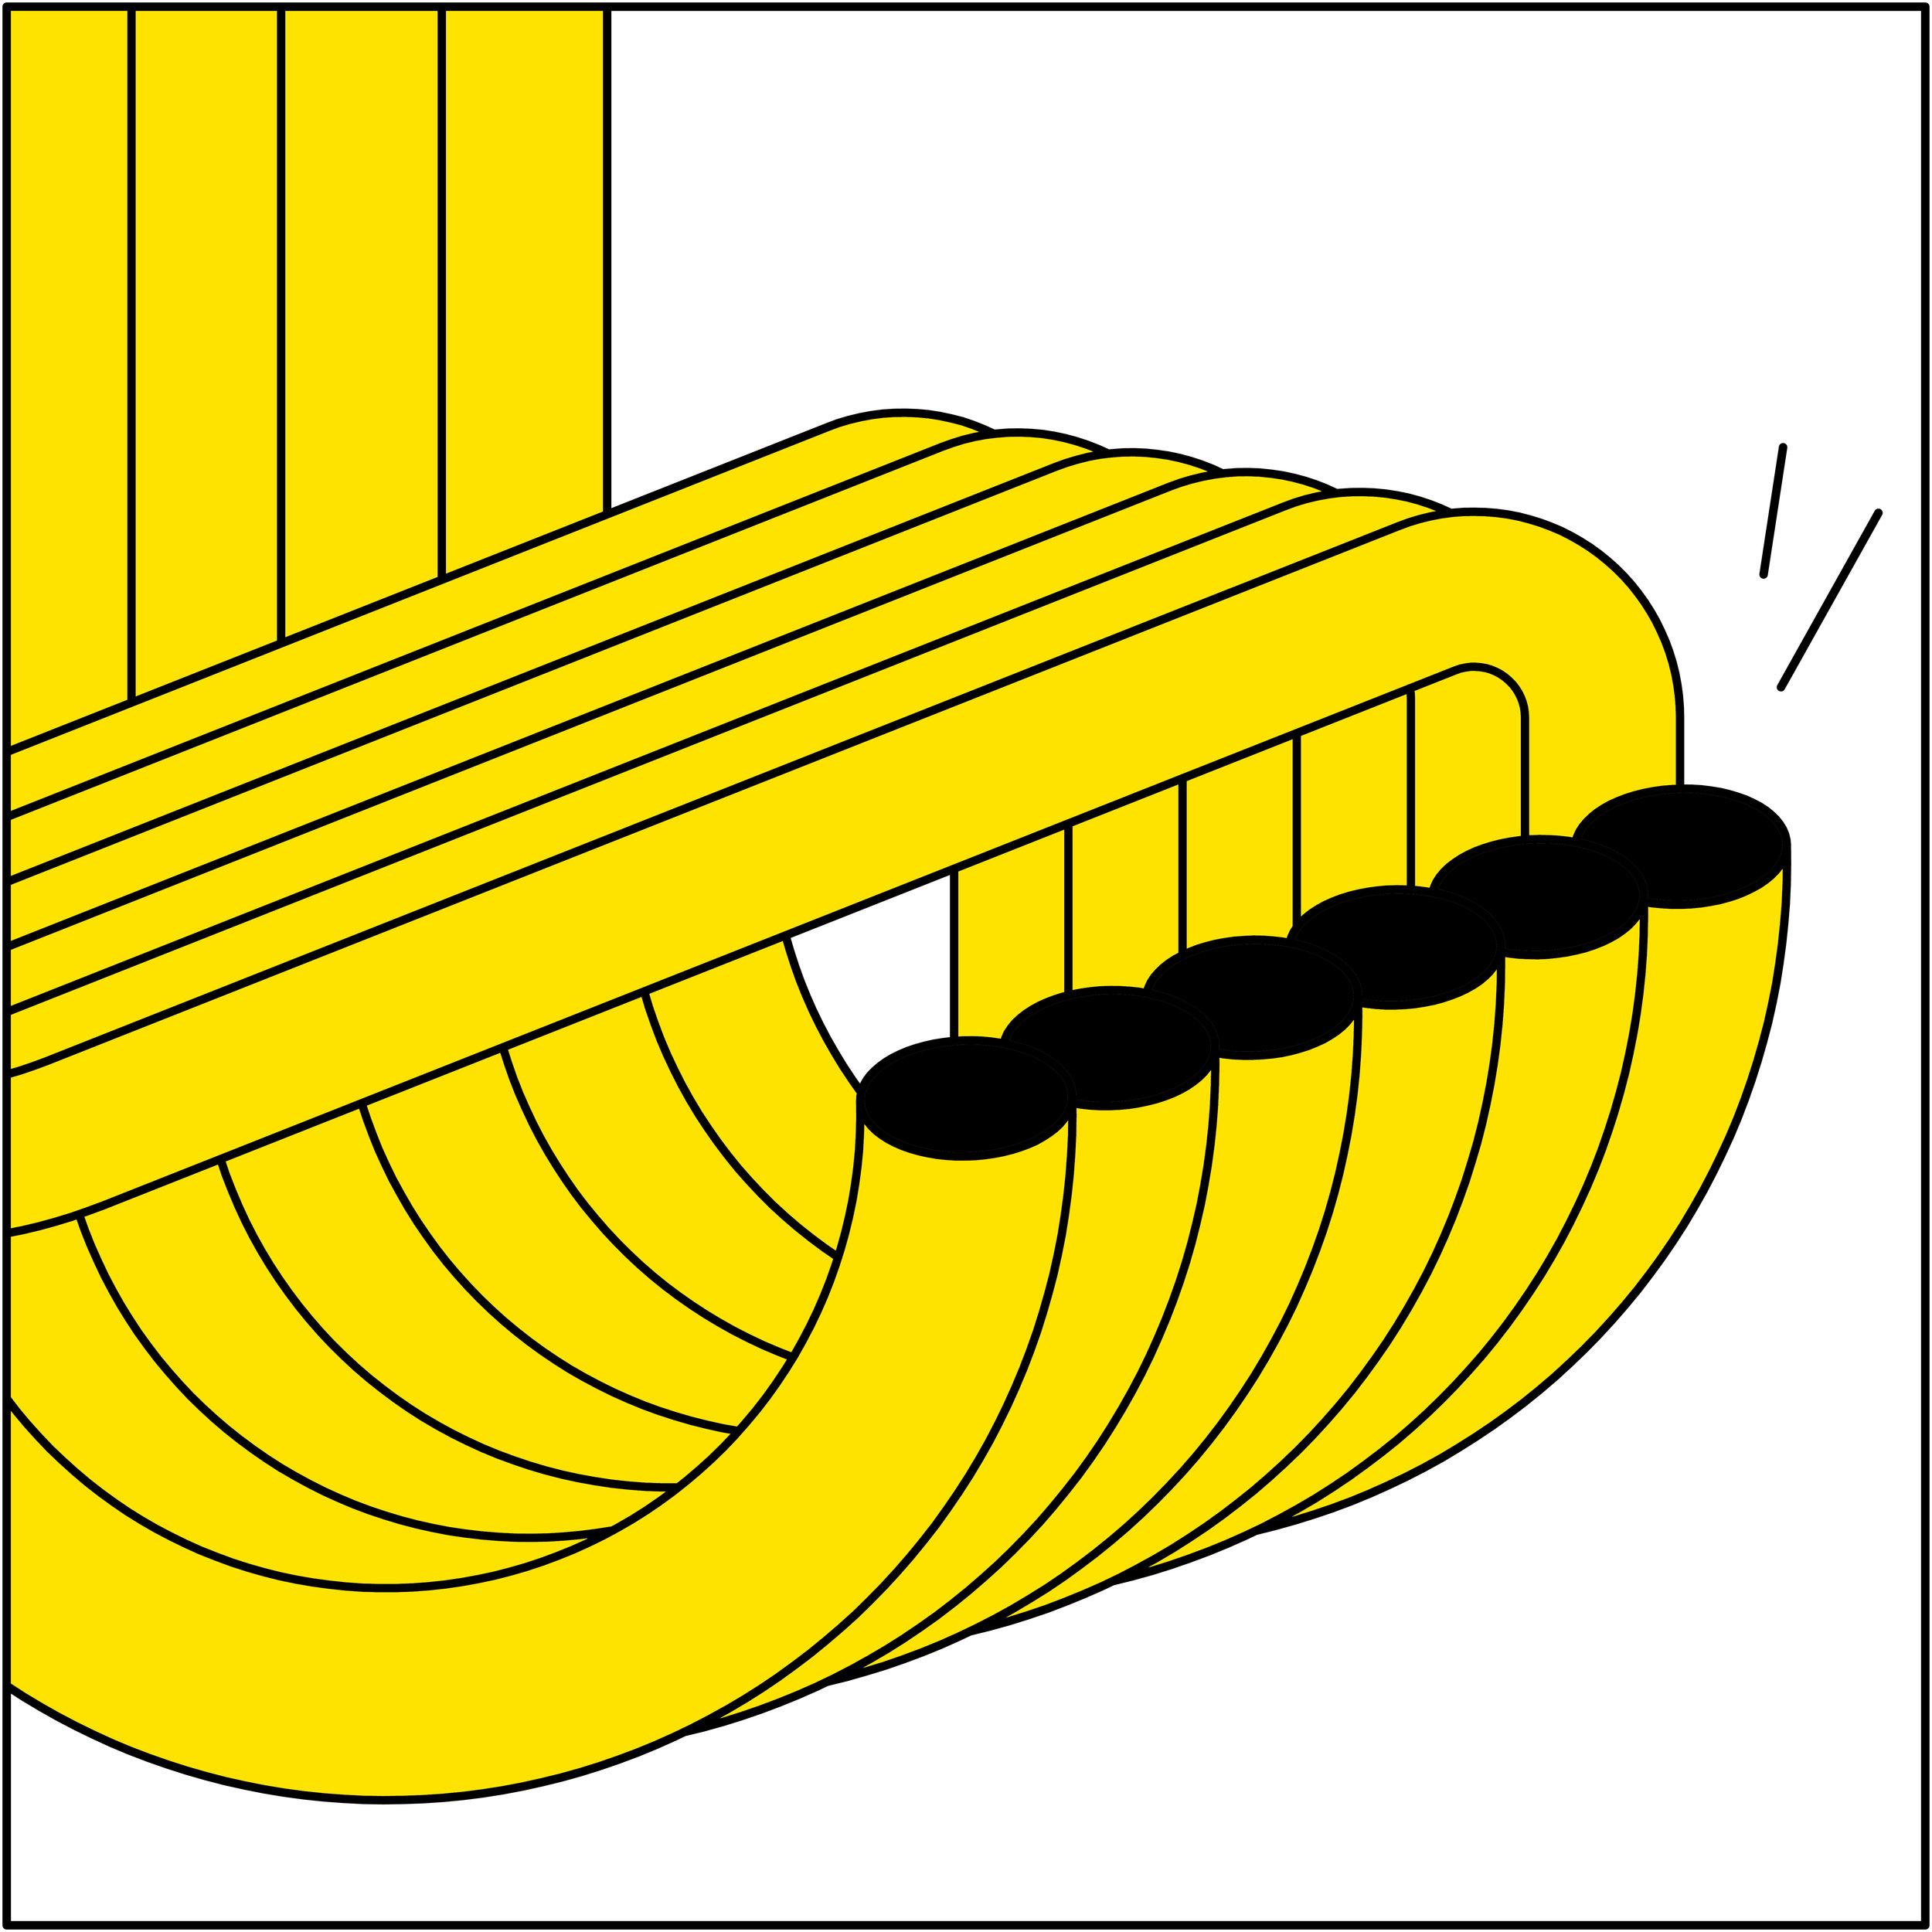 spaghetti yellow - 025.jpg